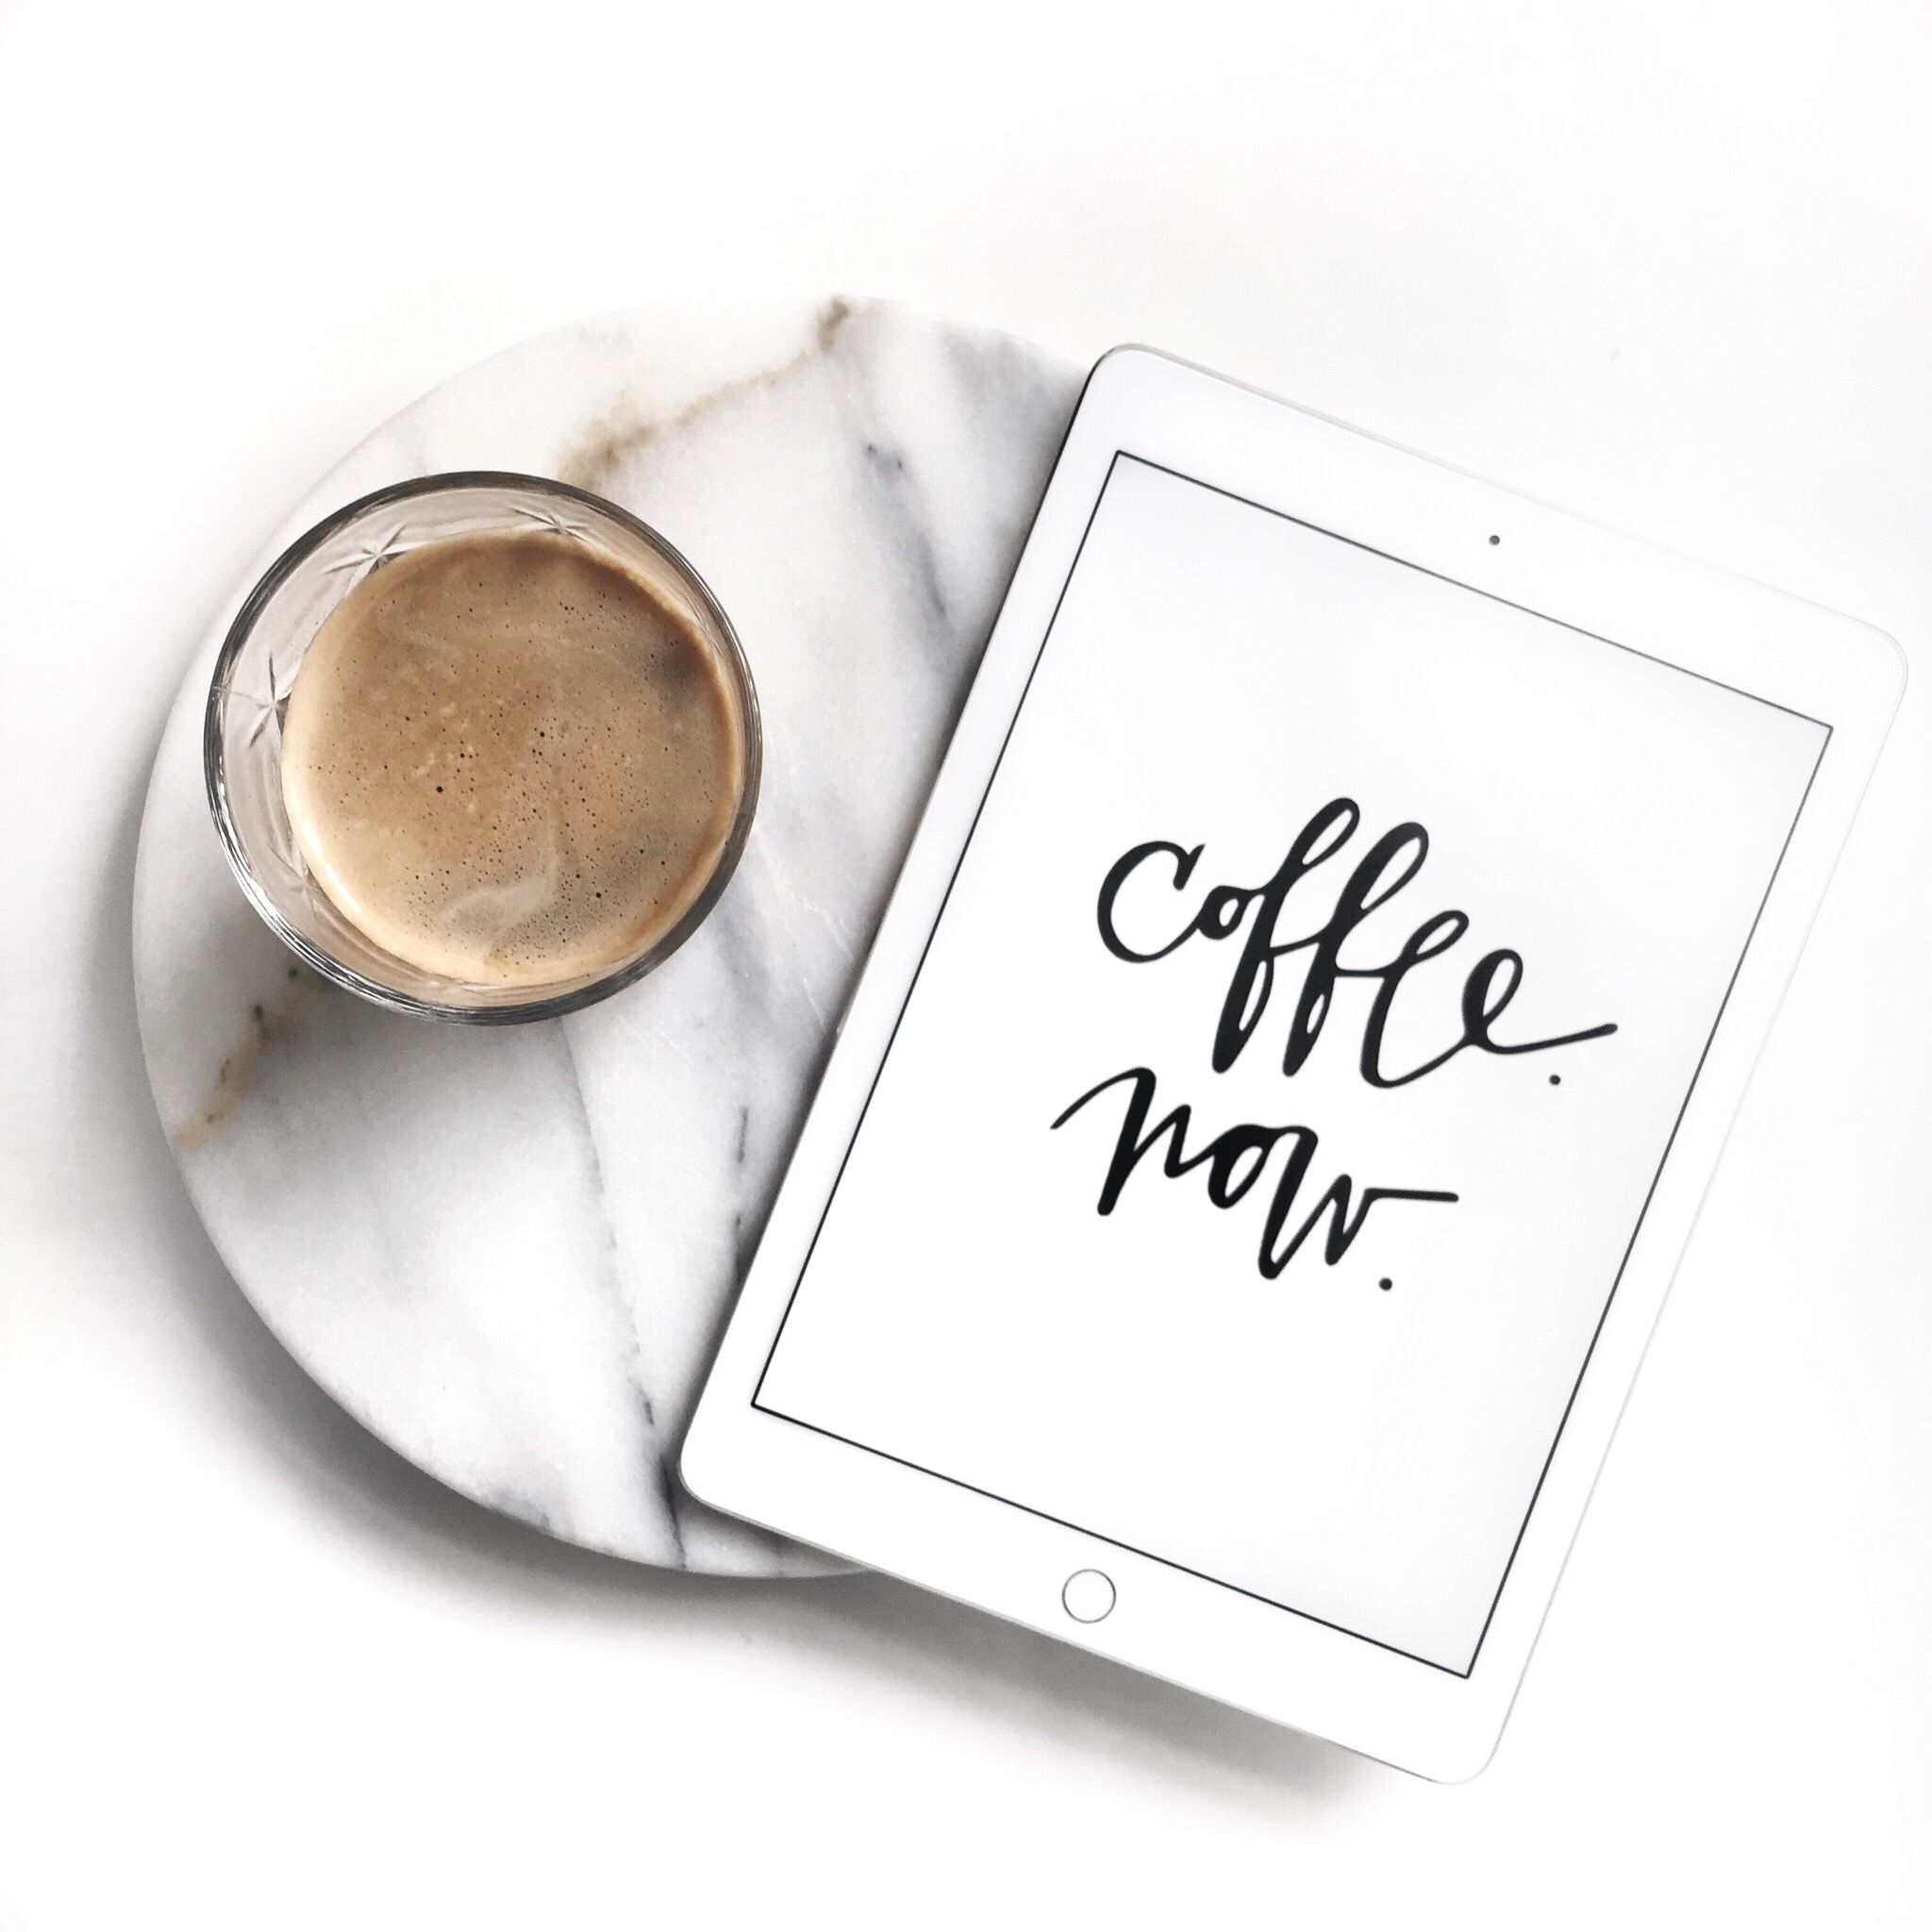 f l a t l a y pinterest instagram foto ideen kaffee bilder. Black Bedroom Furniture Sets. Home Design Ideas